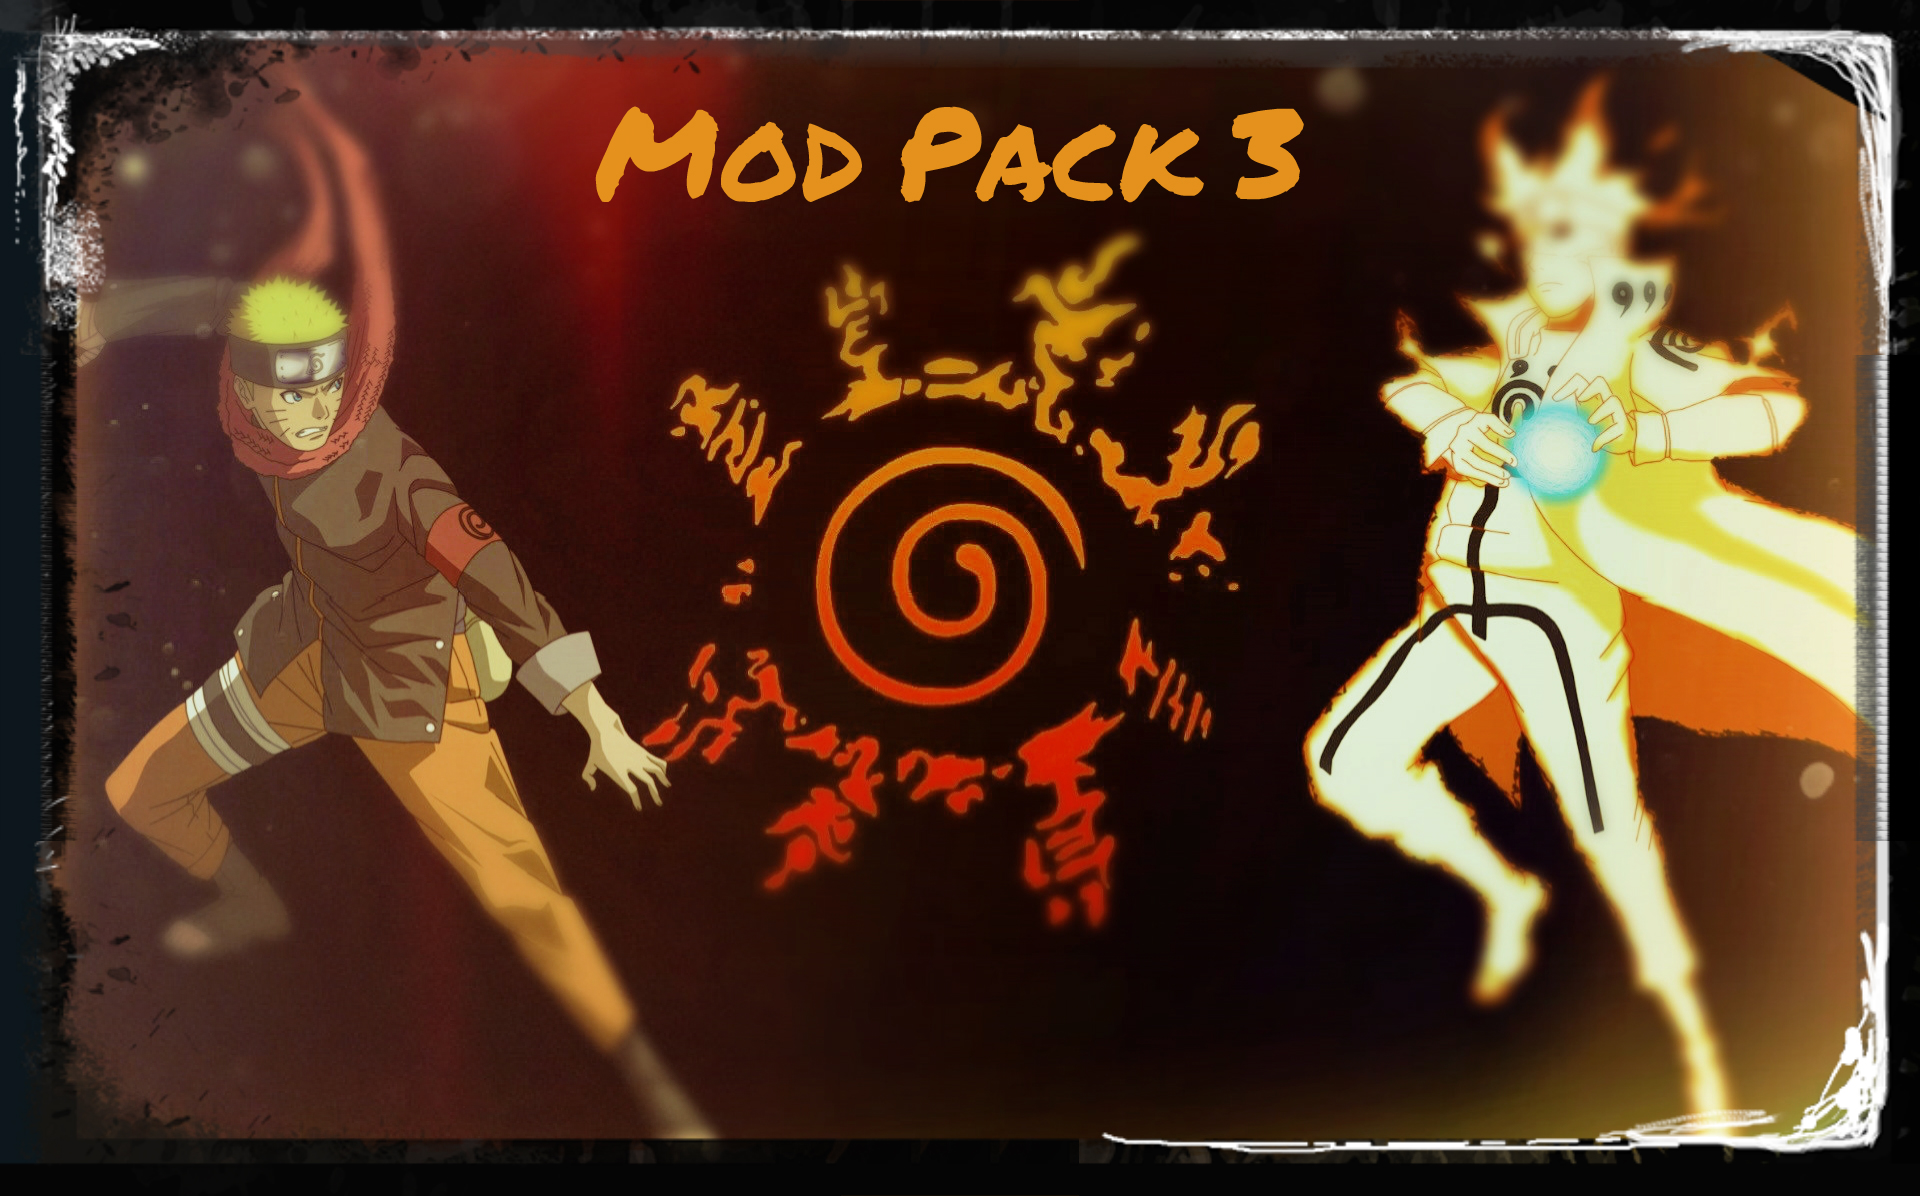 Mod Pack 3